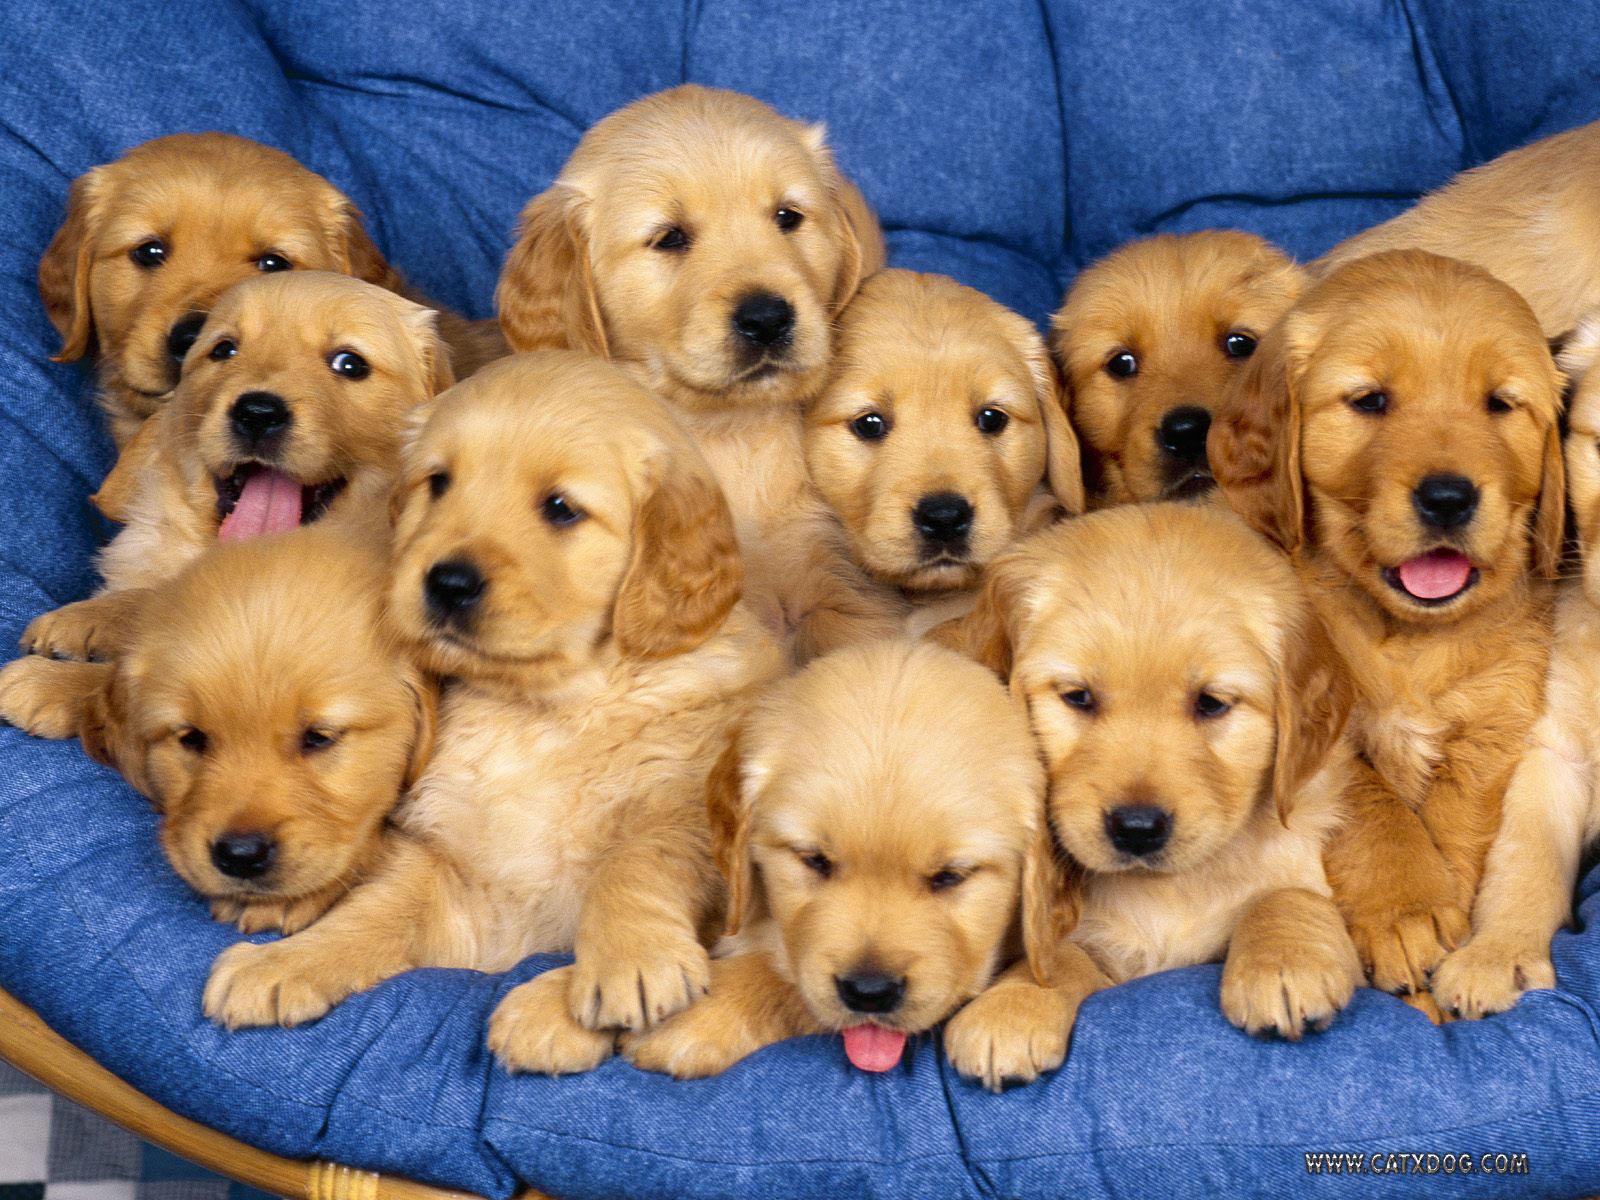 Buy Cheap Rugs Cute Golden Retriever Puppies Photos ~ Cute Puppies ...